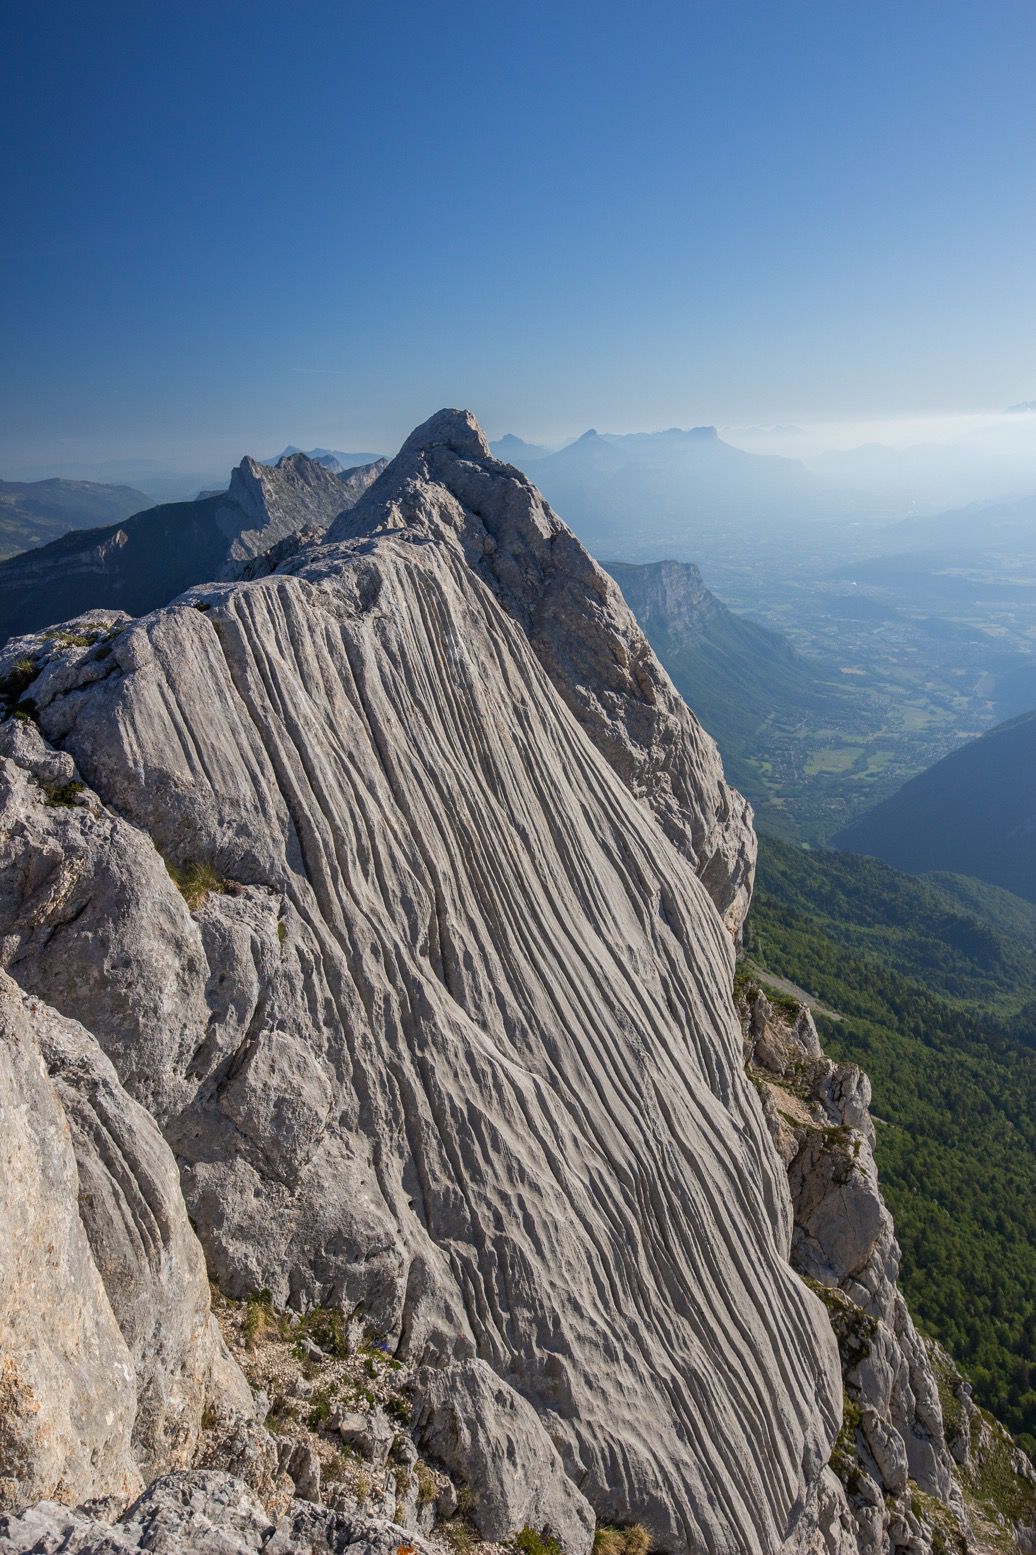 Hauts sommets du Vercors